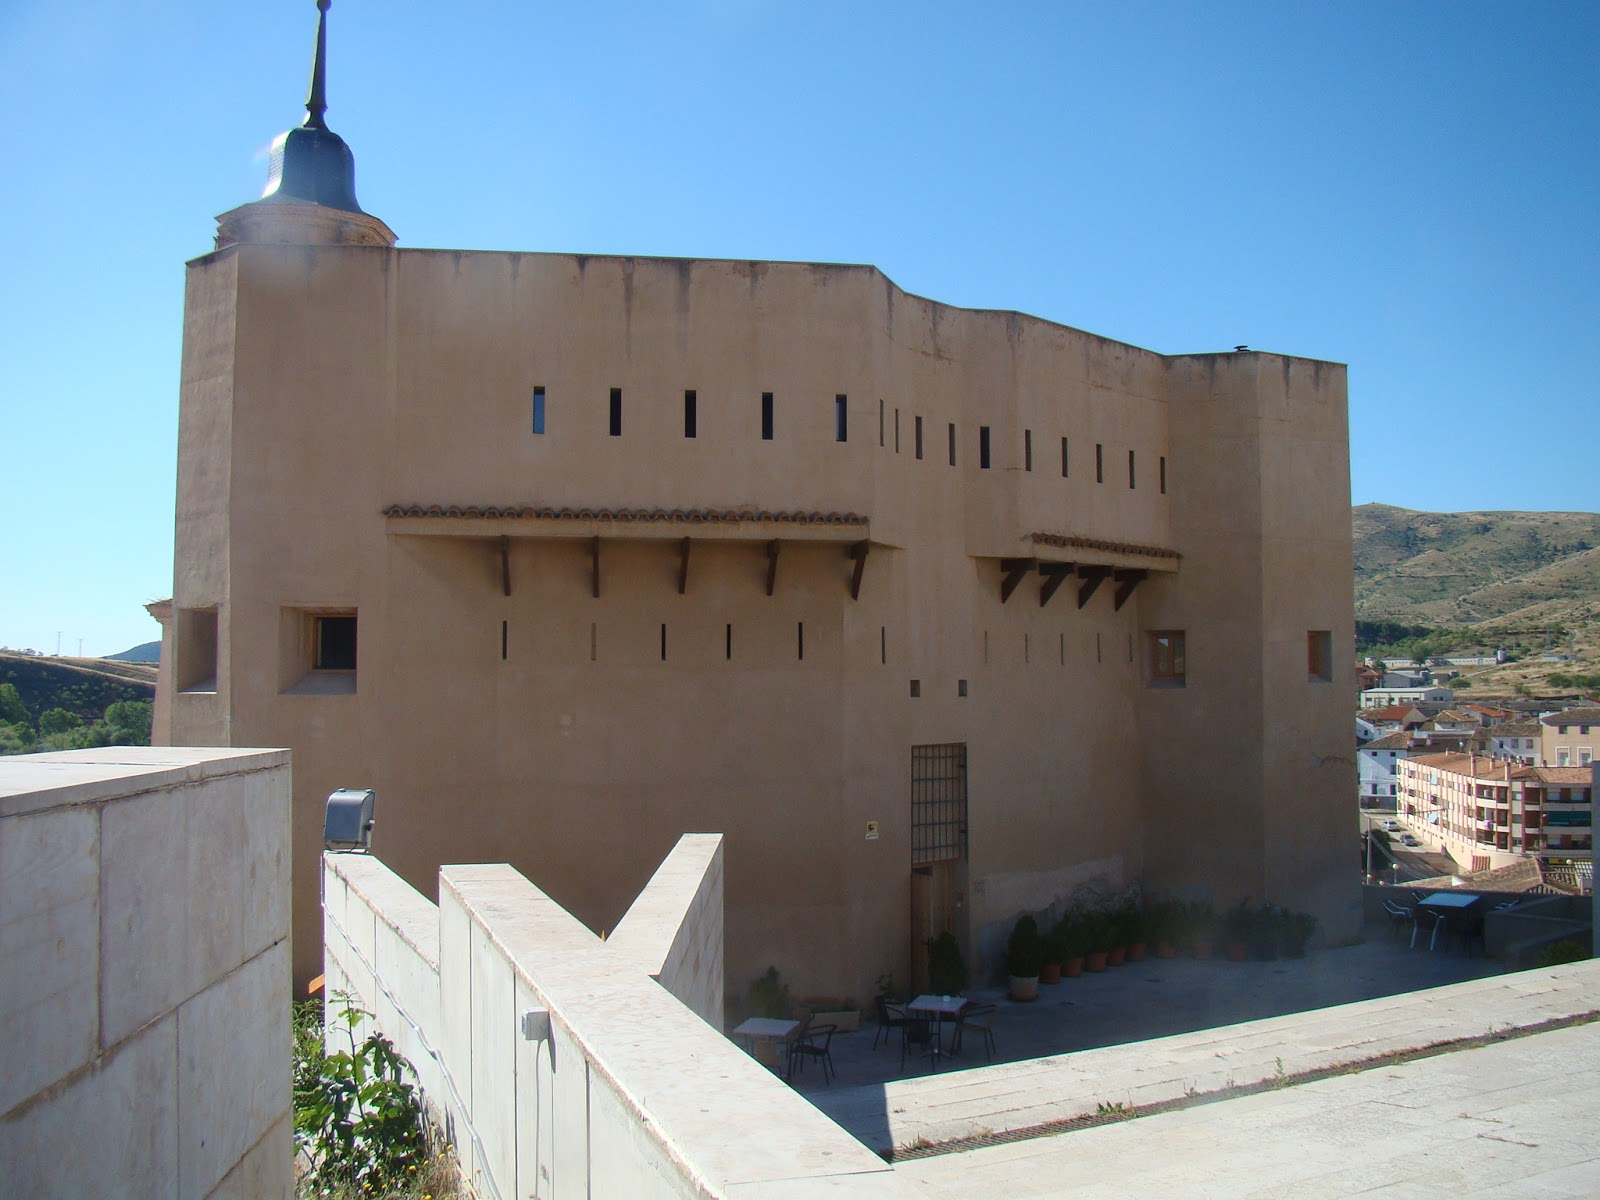 Castillos espa oles castillo de ateca zaragoza - Hotel castillo de ayud ...